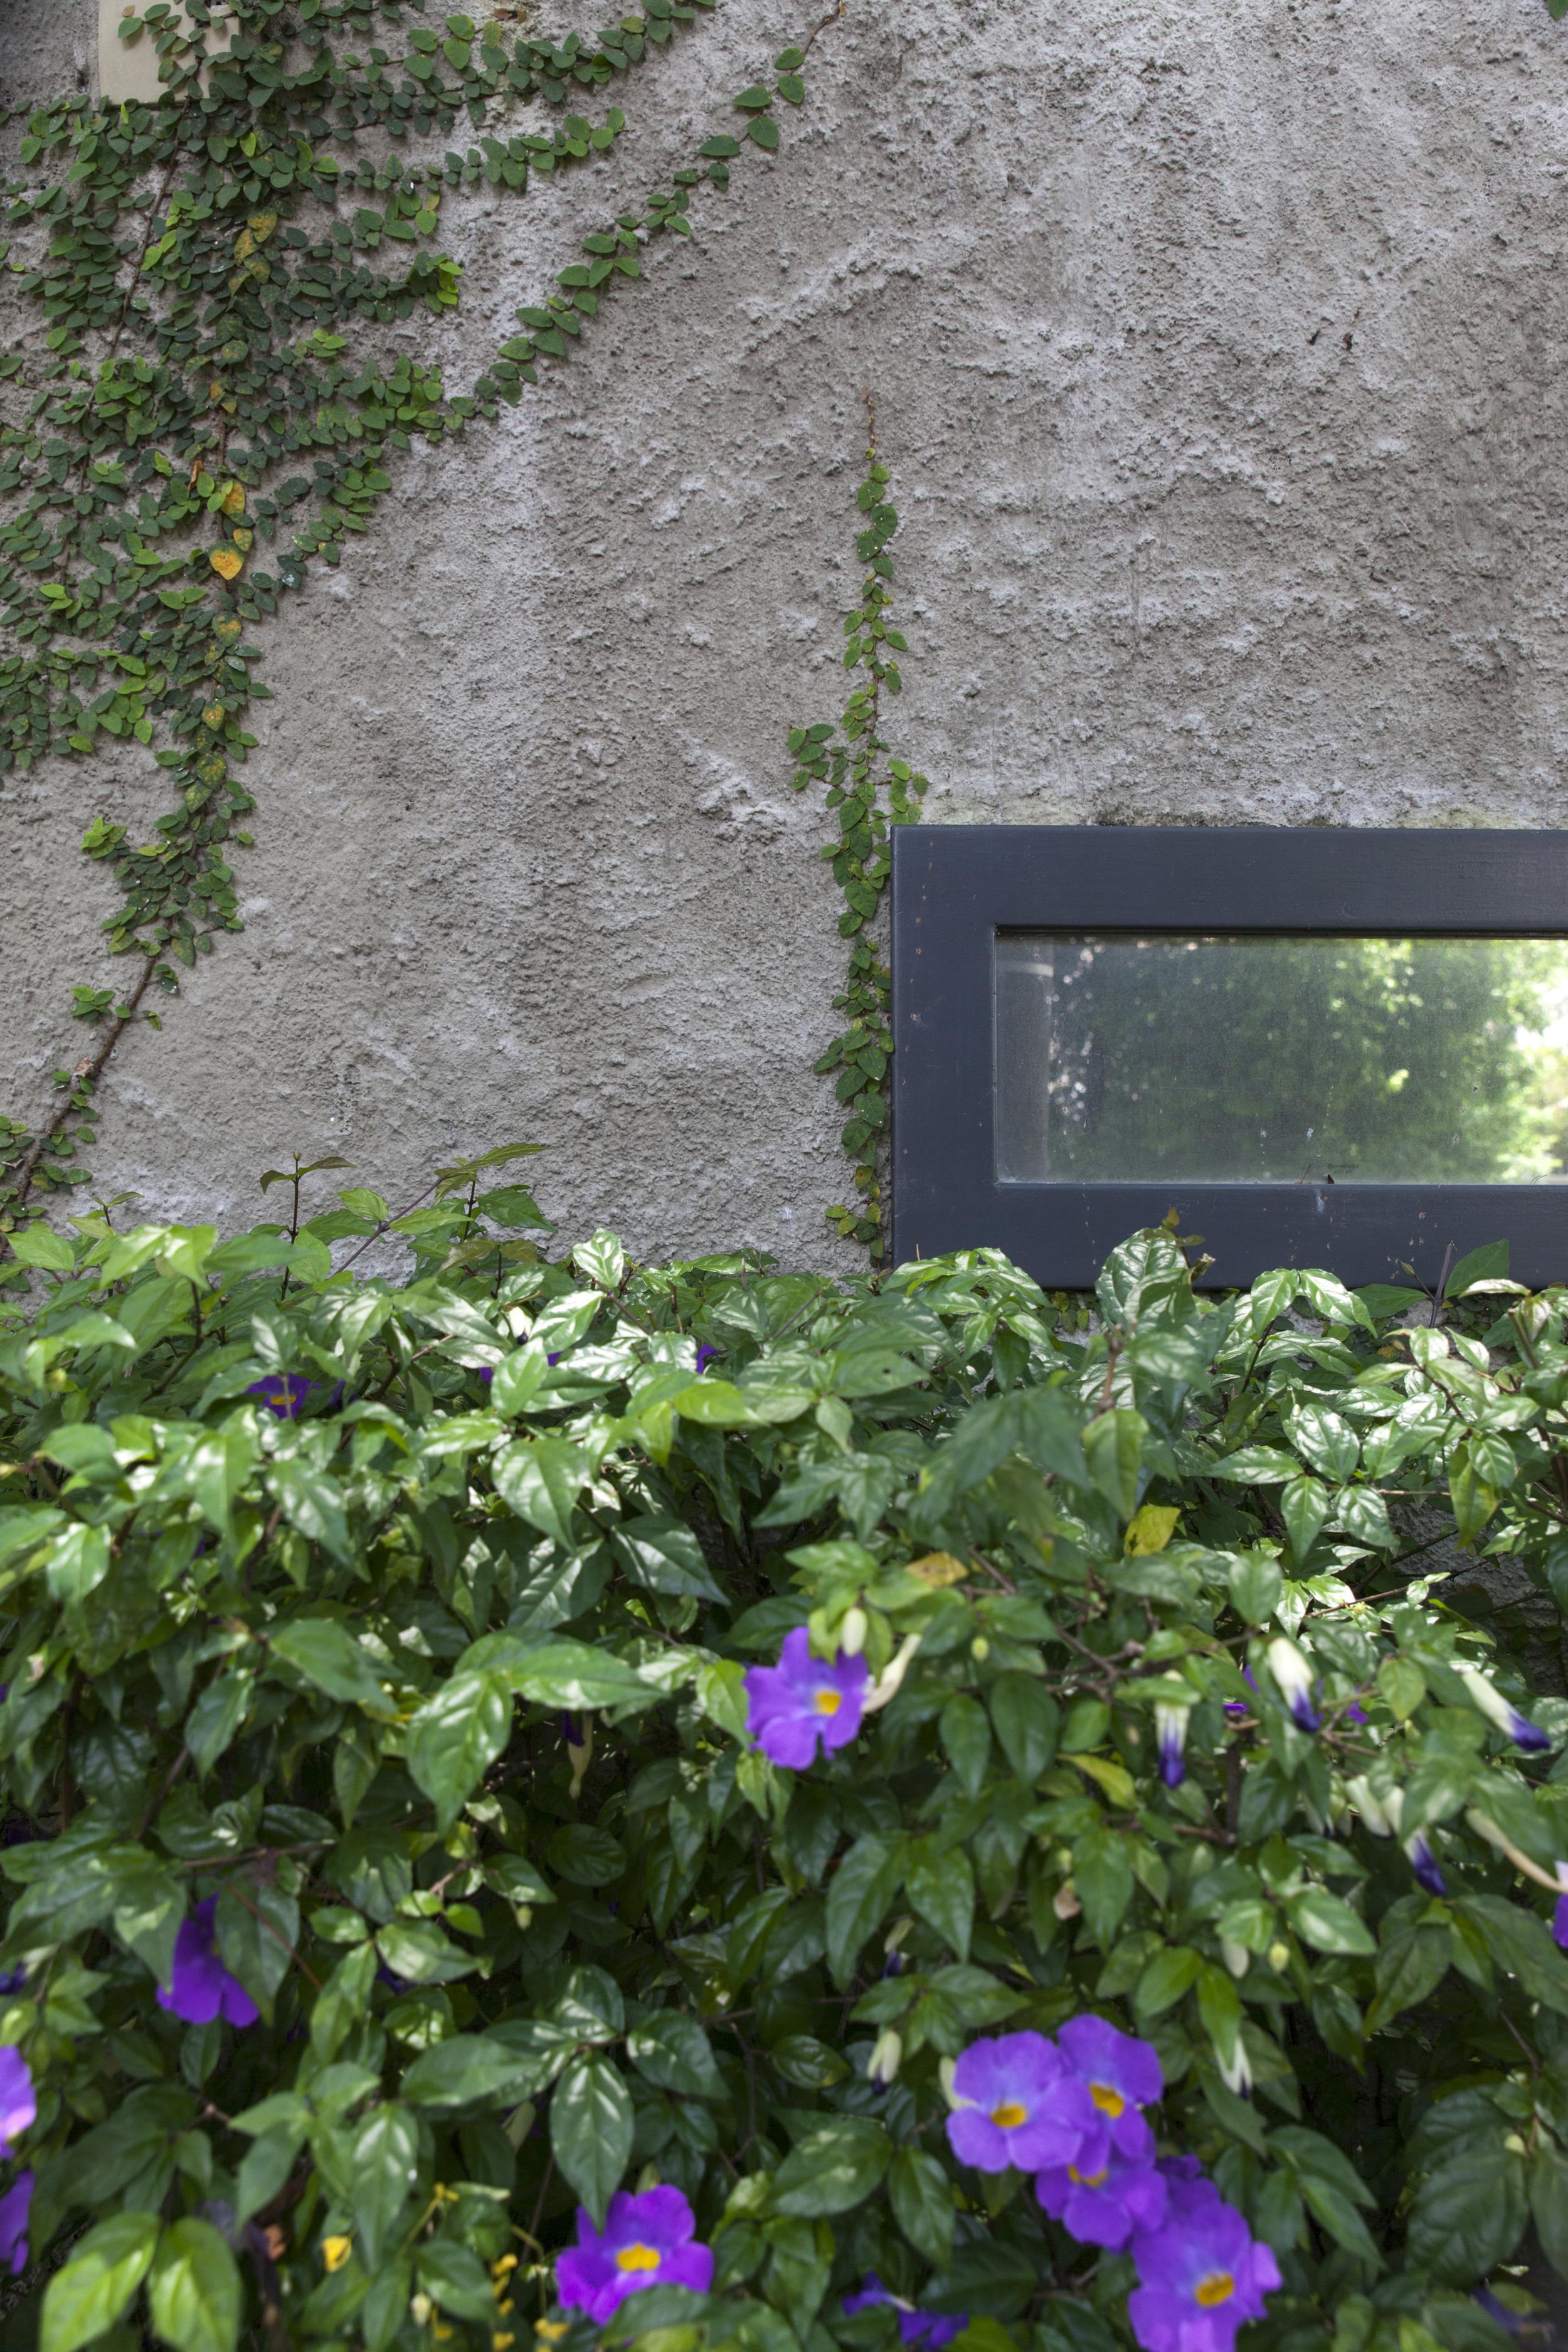 GardenOfEurope_#9_JonathanUssingMagyar_2015-9328.jpg